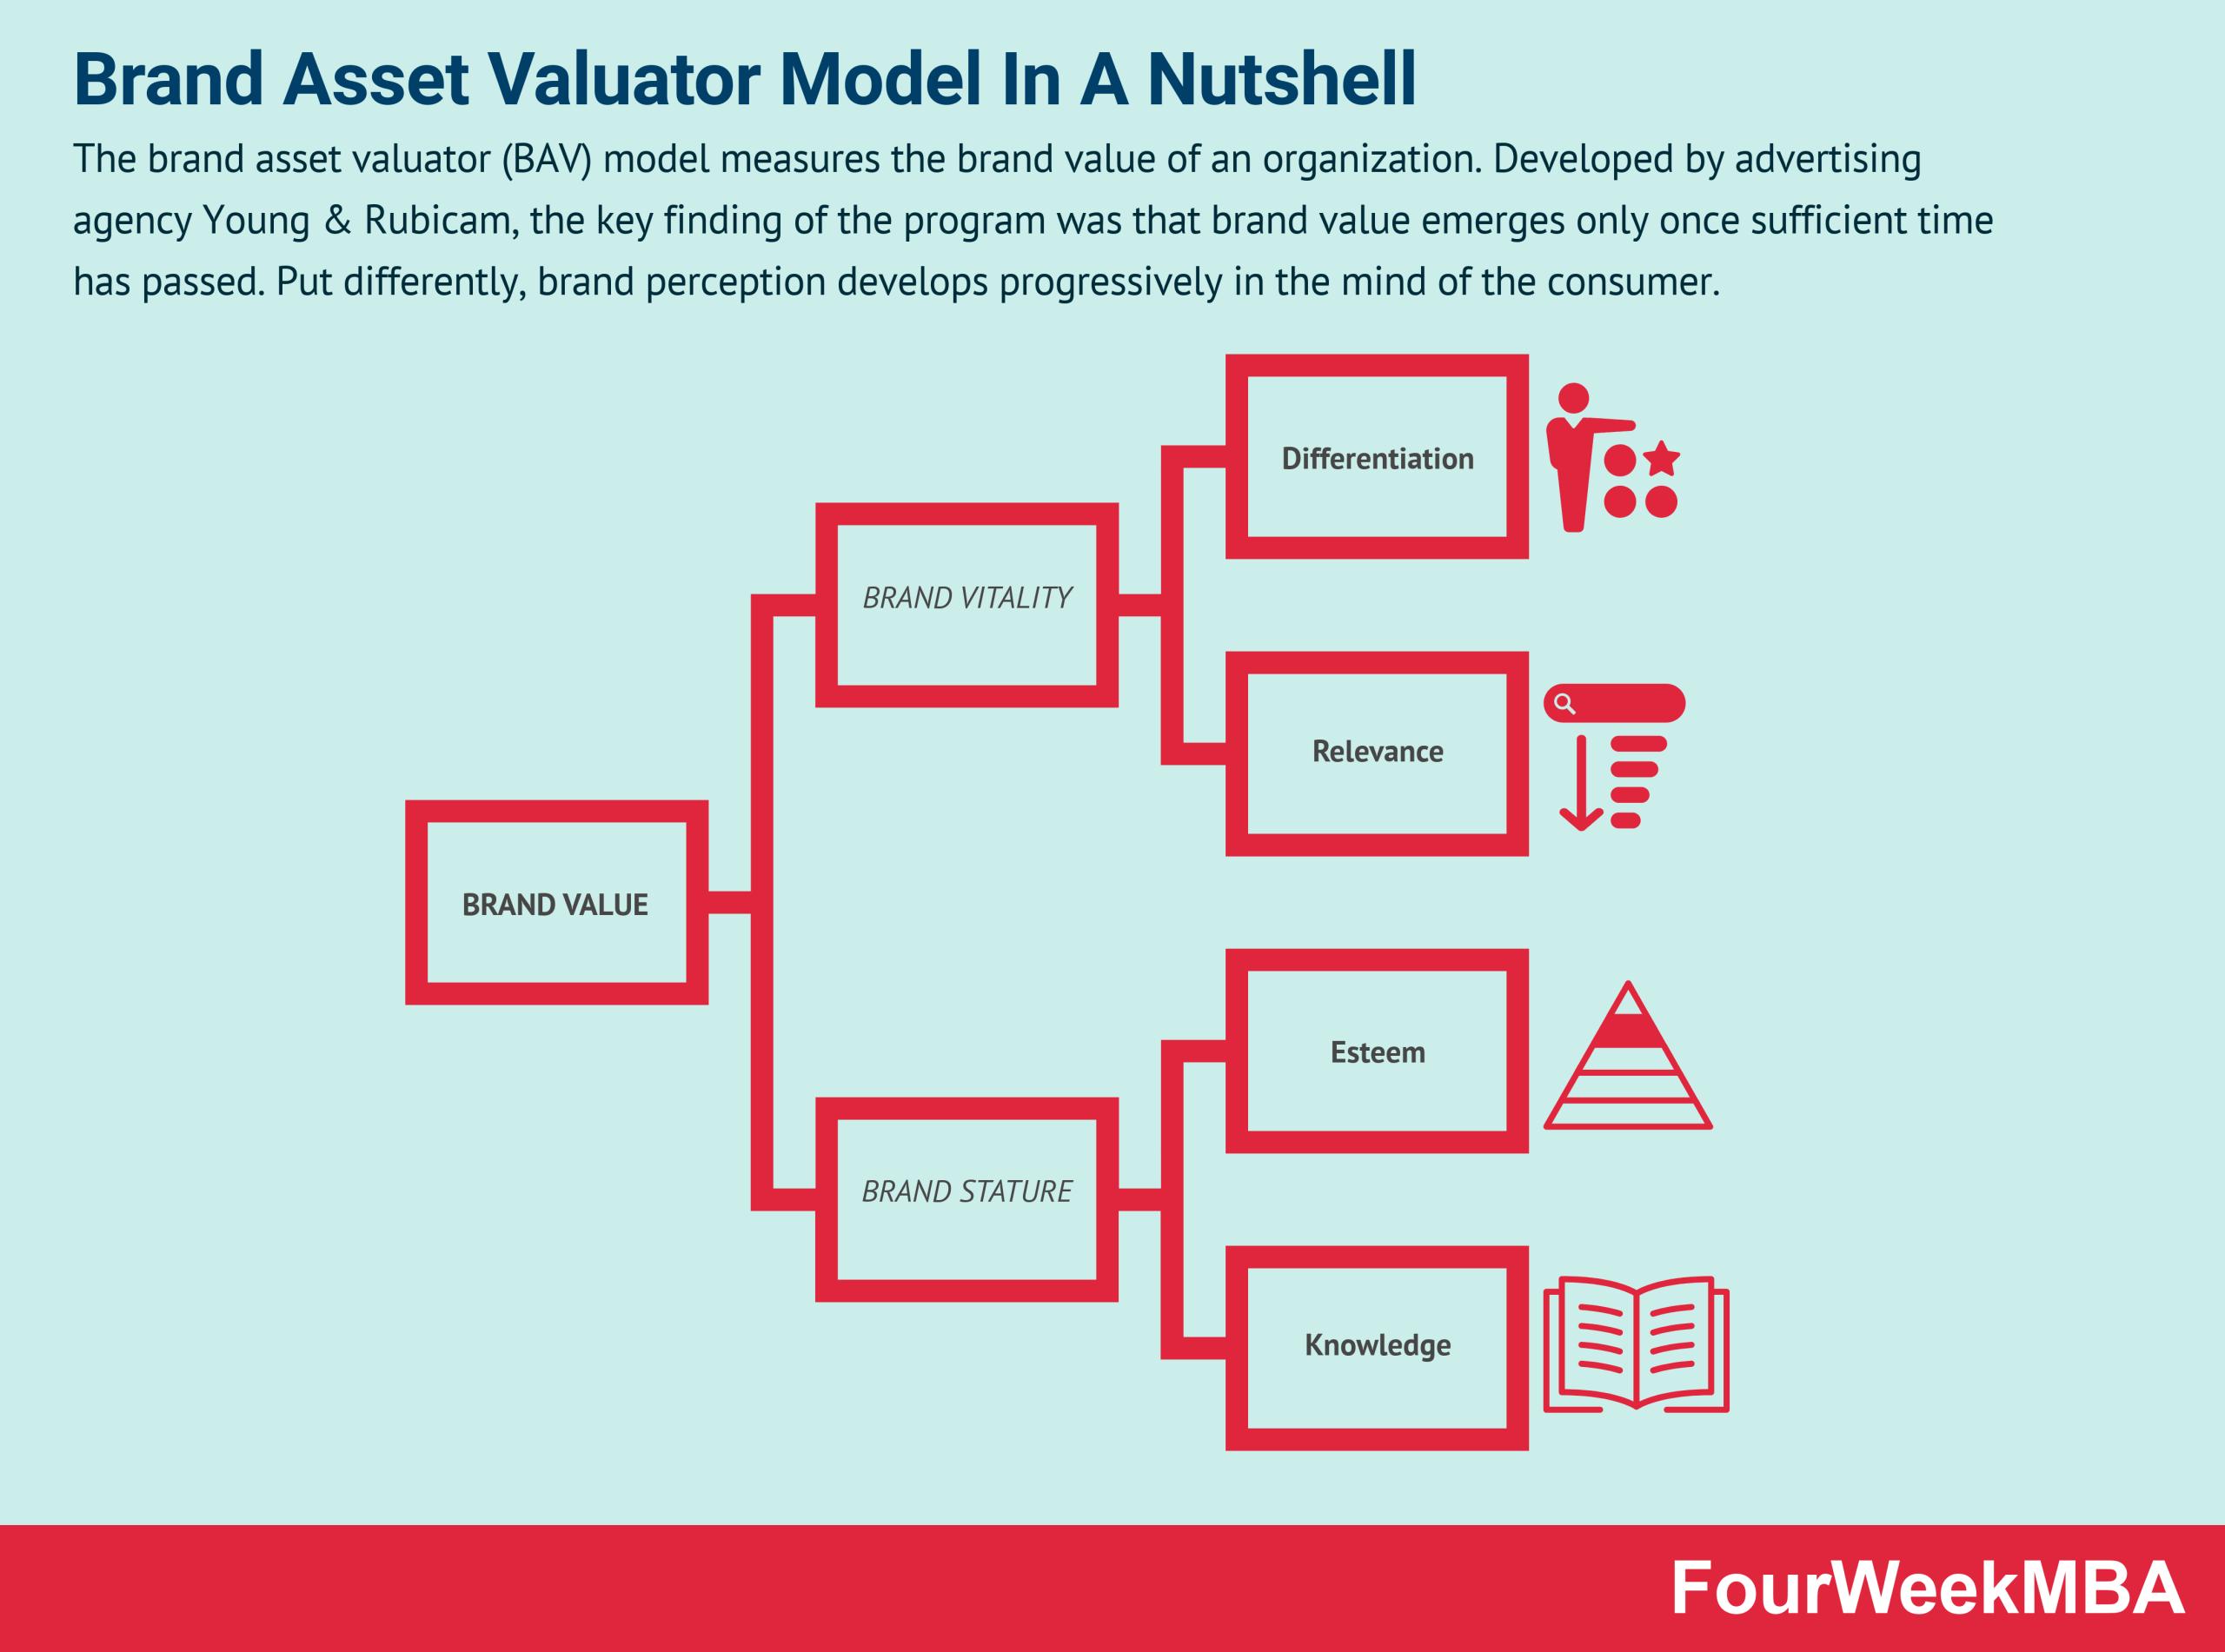 brand-asset-valuator-model